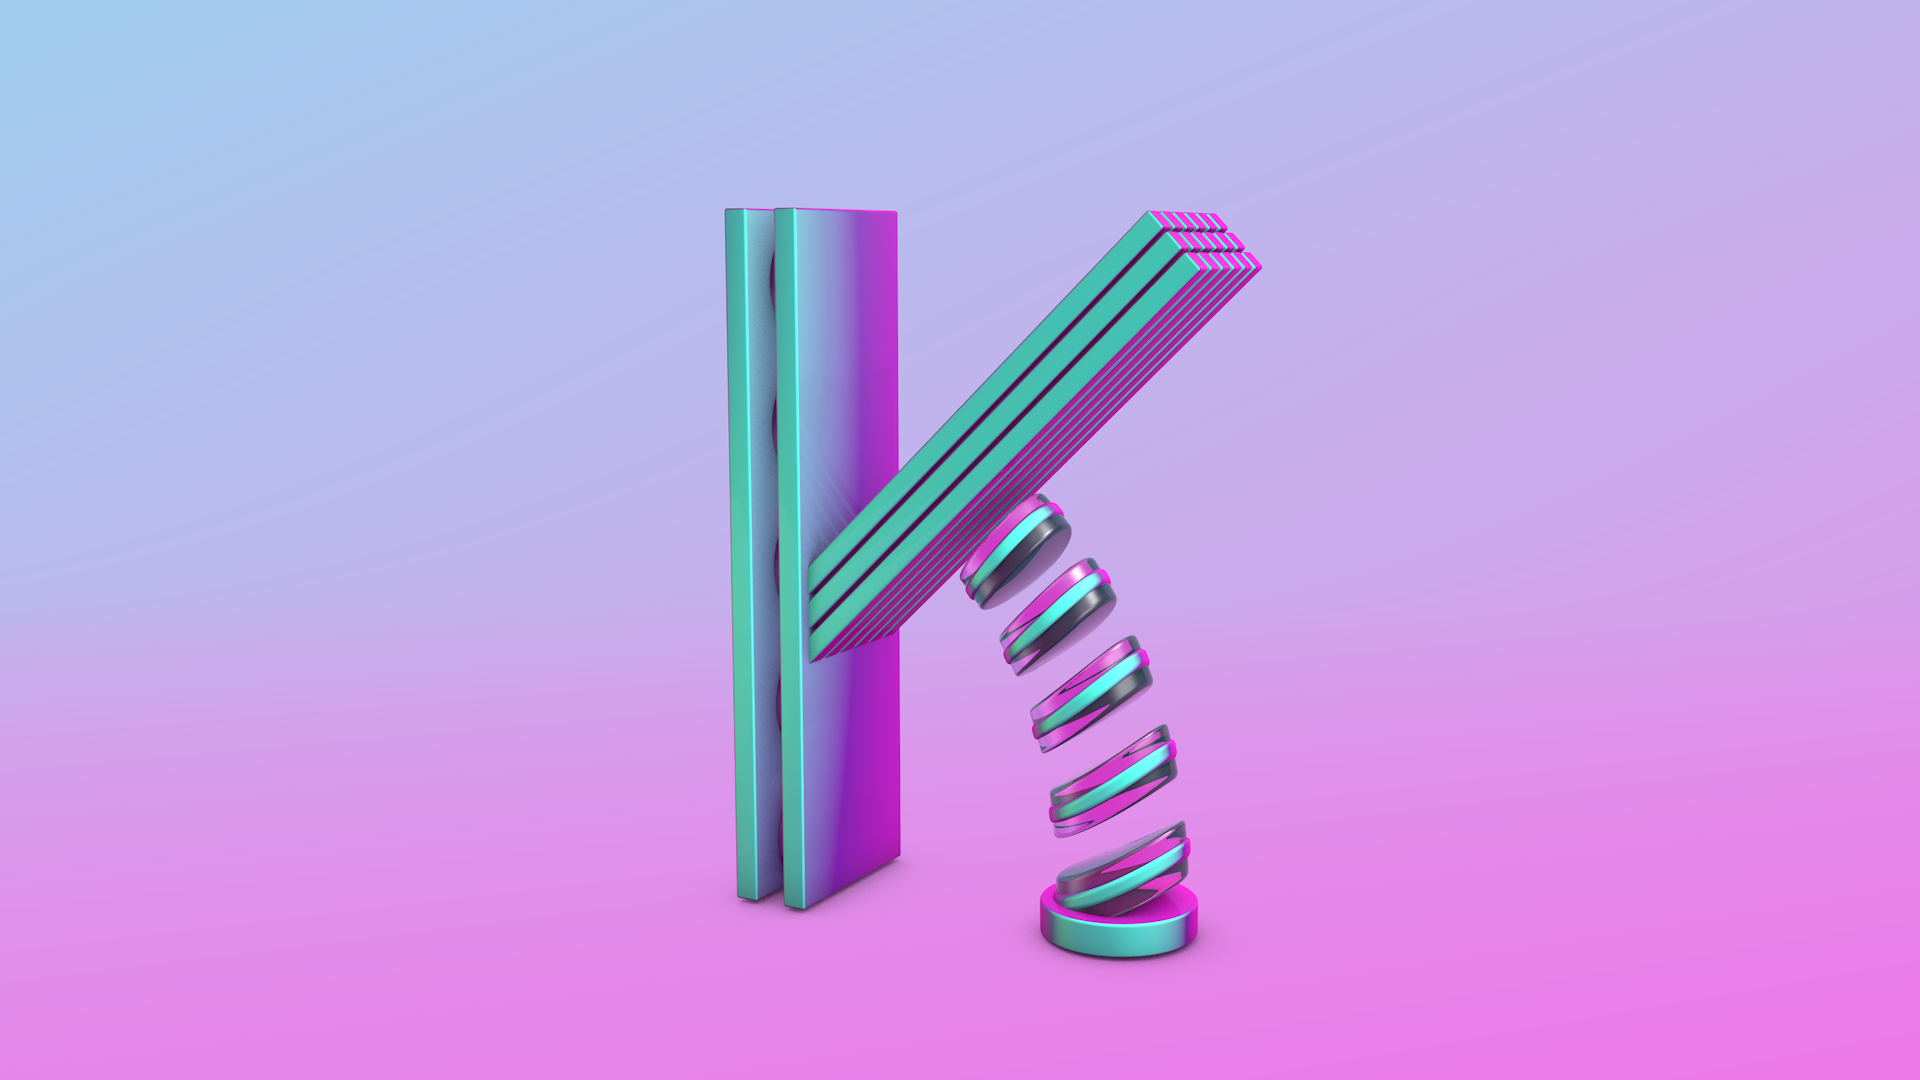 Kv3_0101.png